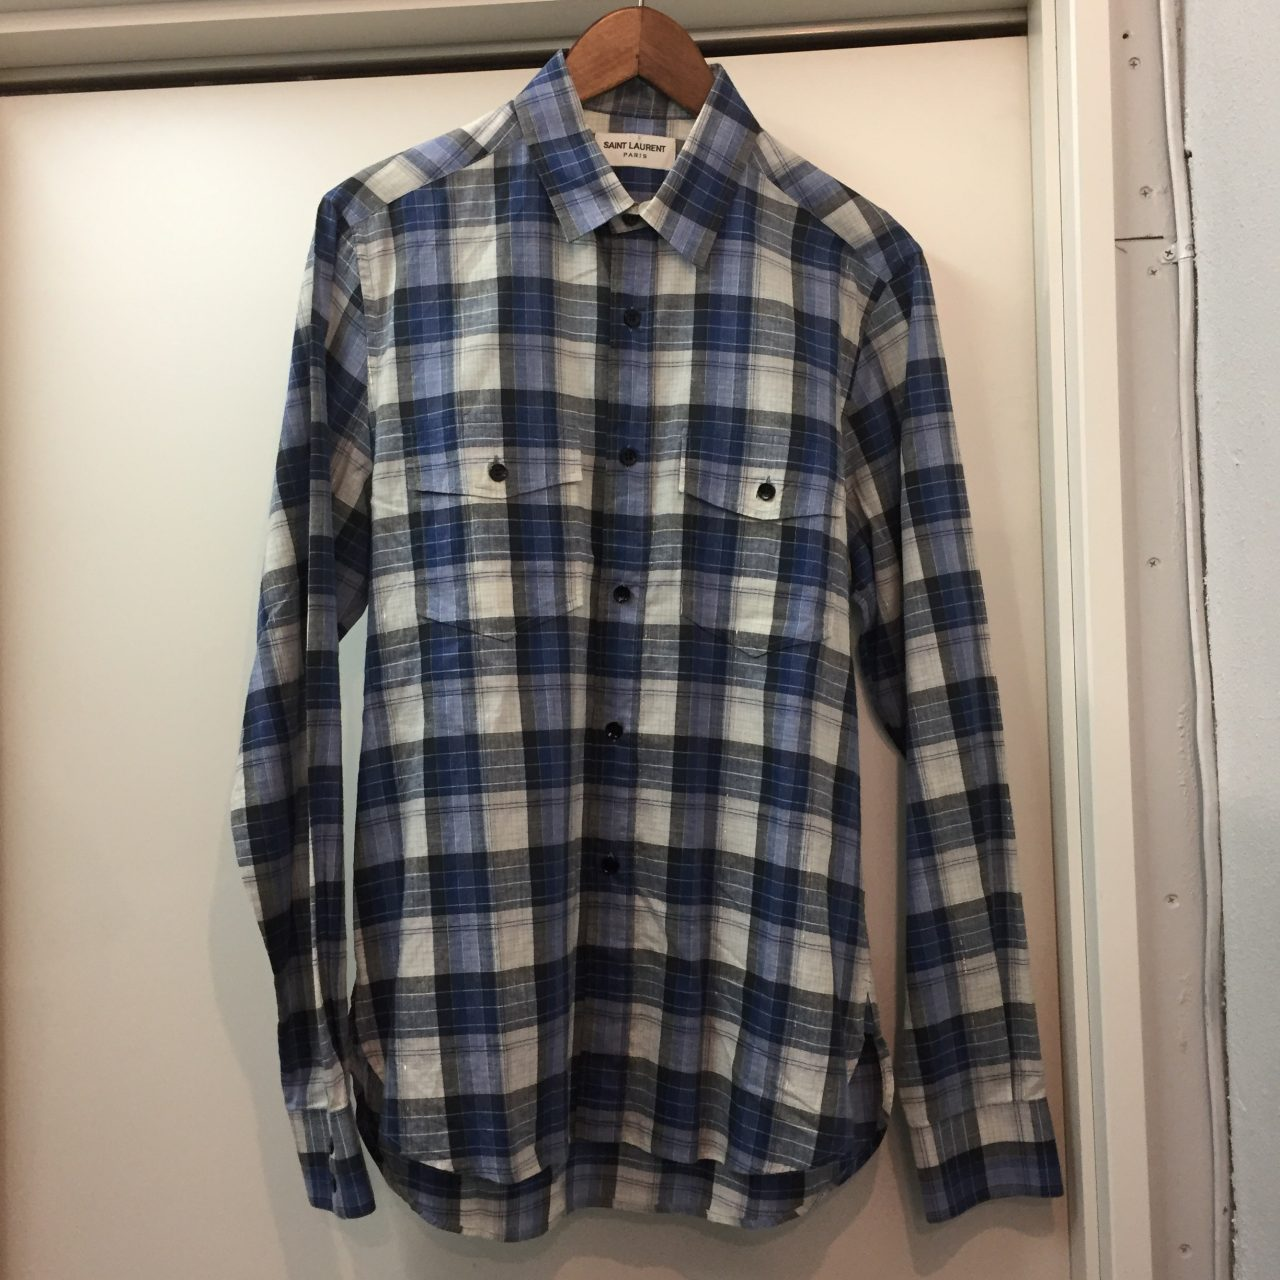 SAINT LAURENT PARIS 15SS 金糸チェック柄ポケットシャツ